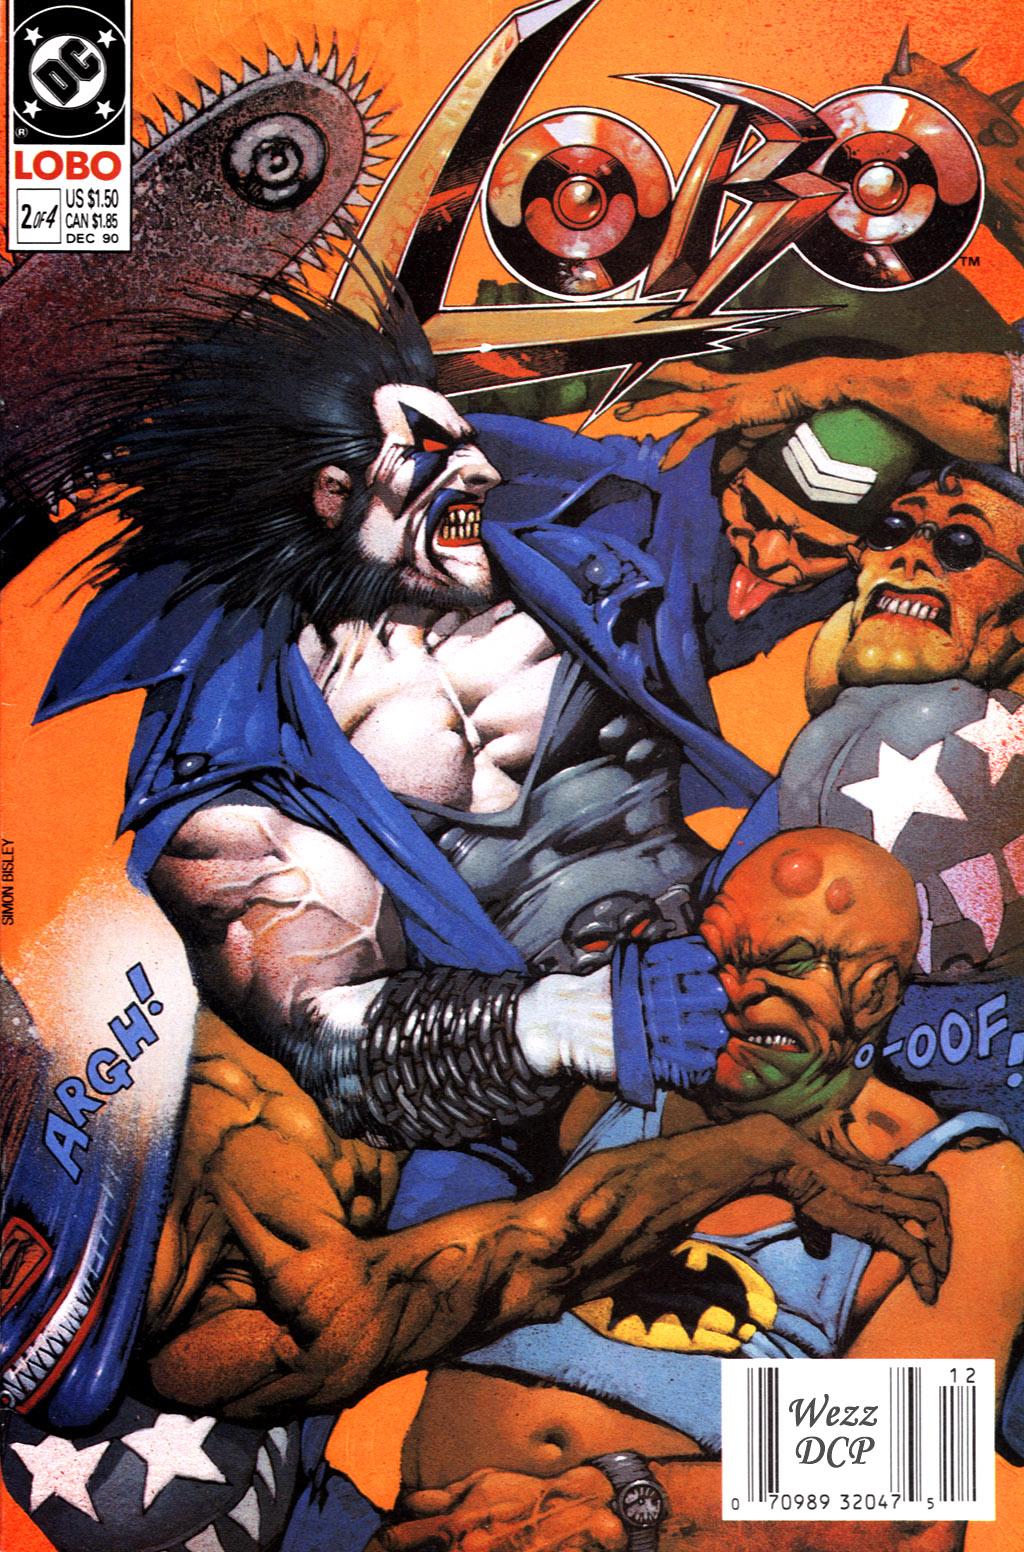 [Comics] The All New All Different Club Literario de Psicomics Lobo-The-Last-Czarnian-Wezz-DCP-02-00